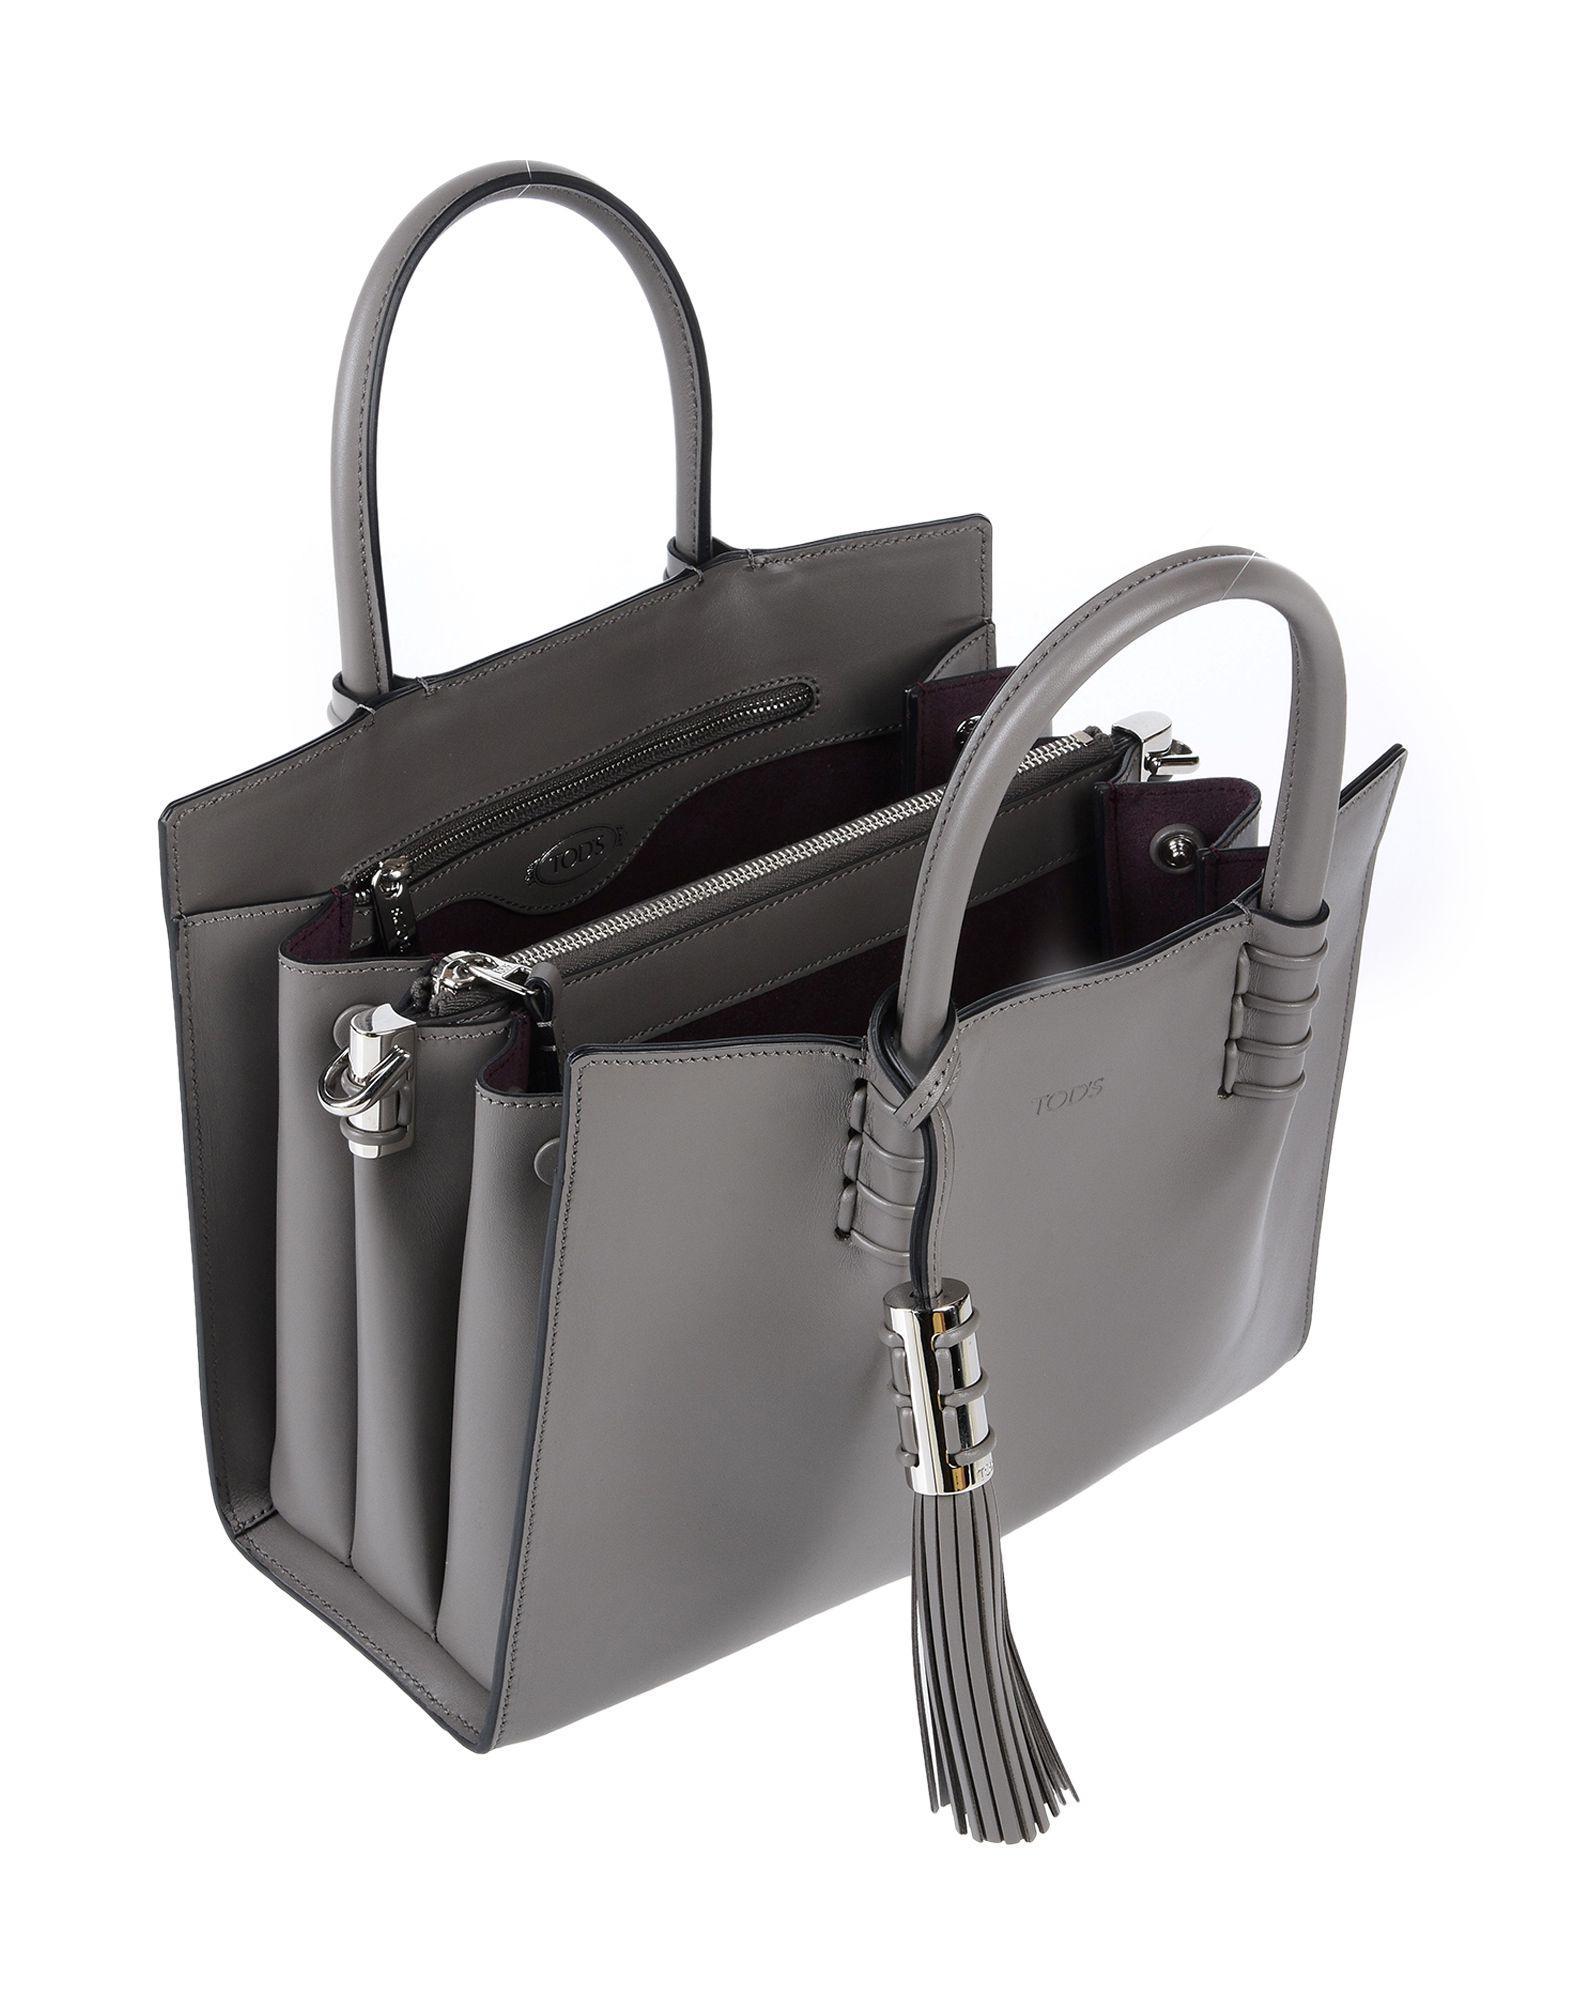 Tod's Handtaschen in Grau Kn8a3